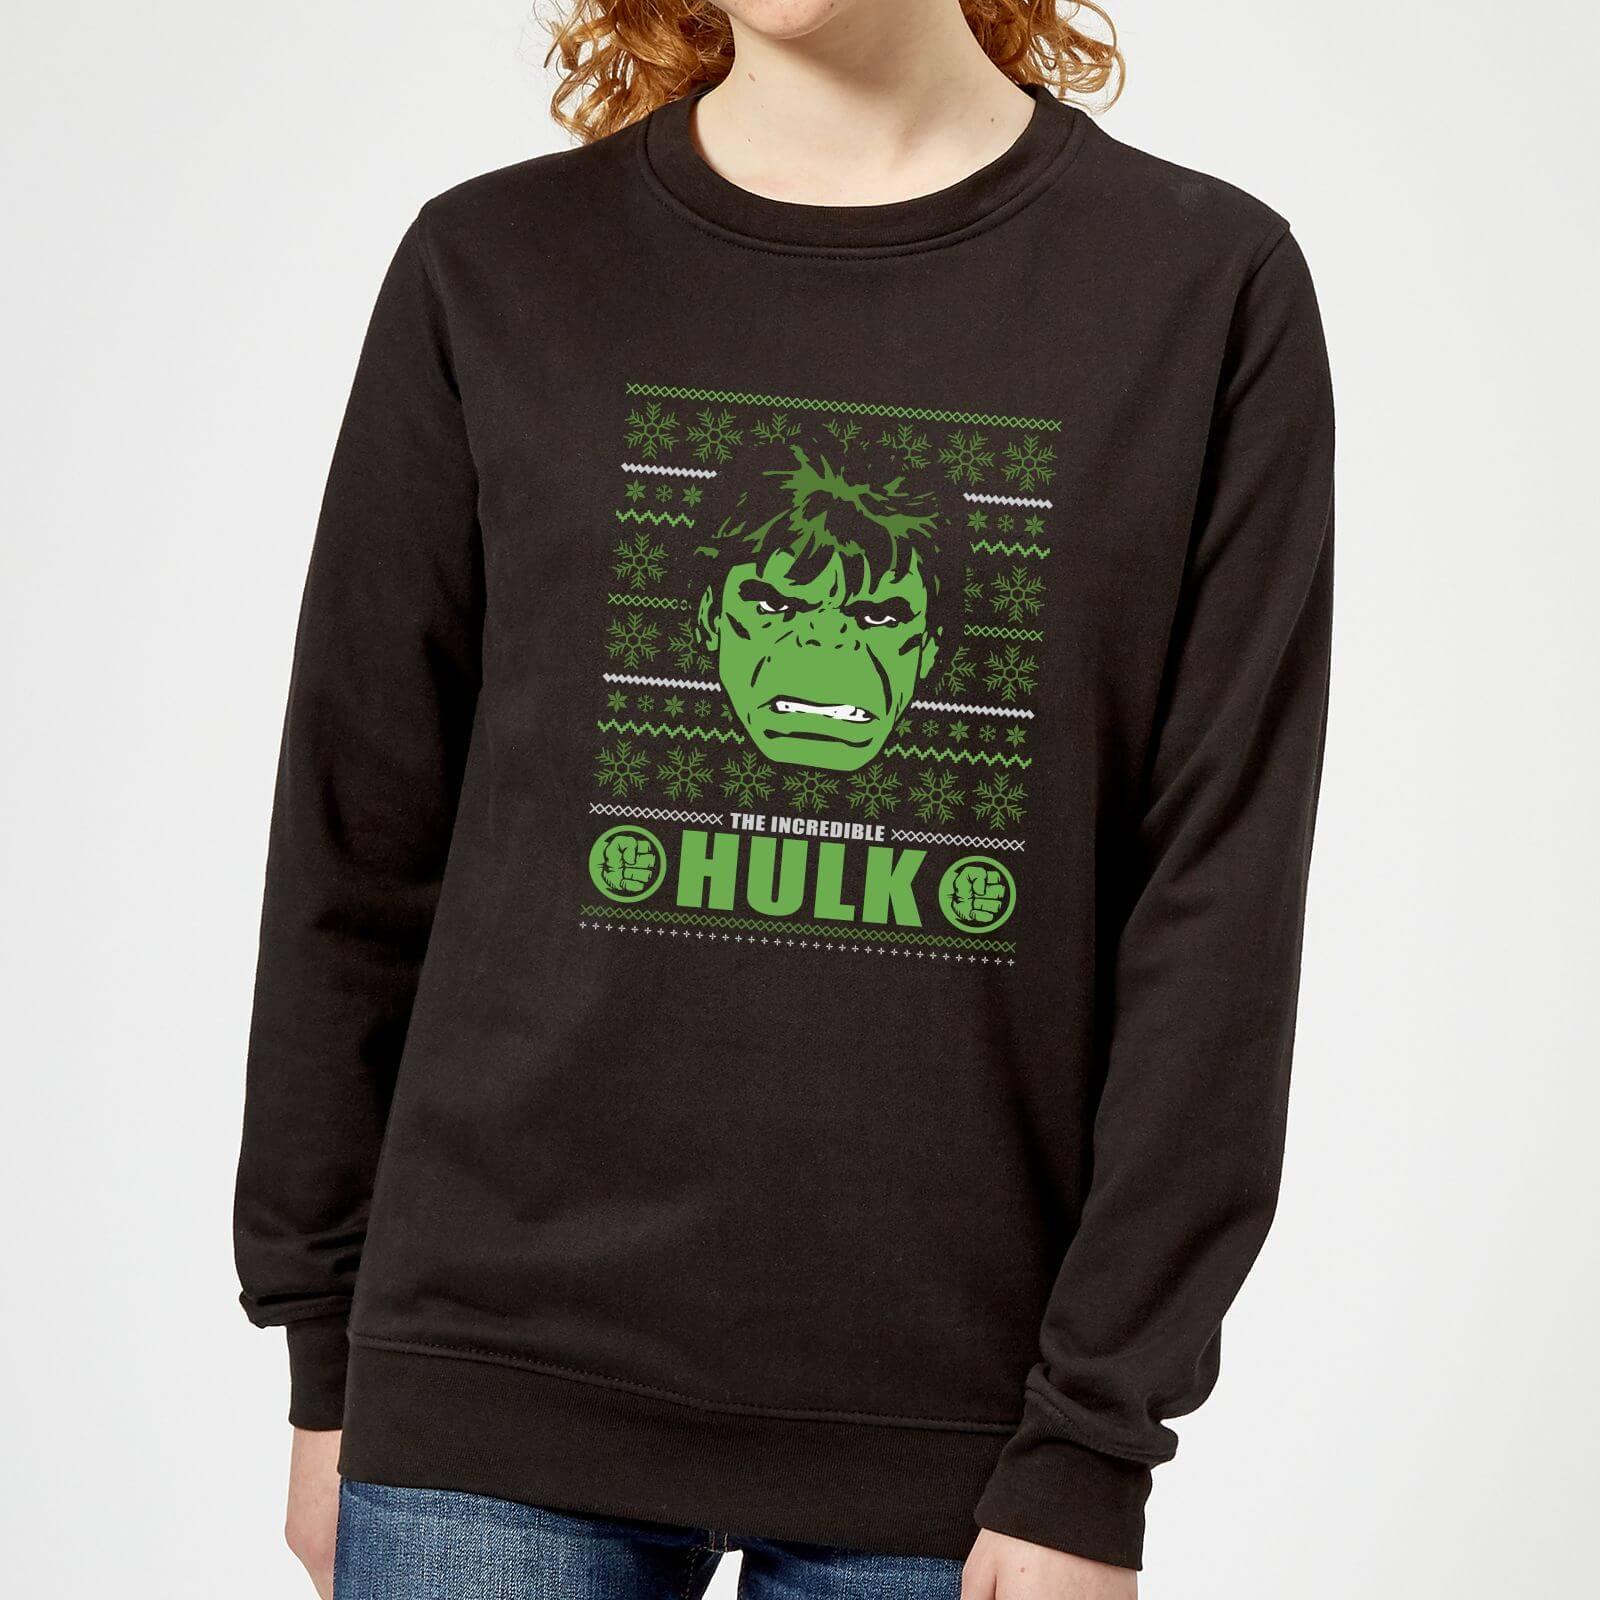 Marvel Hulk Face Women's Christmas Sweatshirt - Black - M - Black